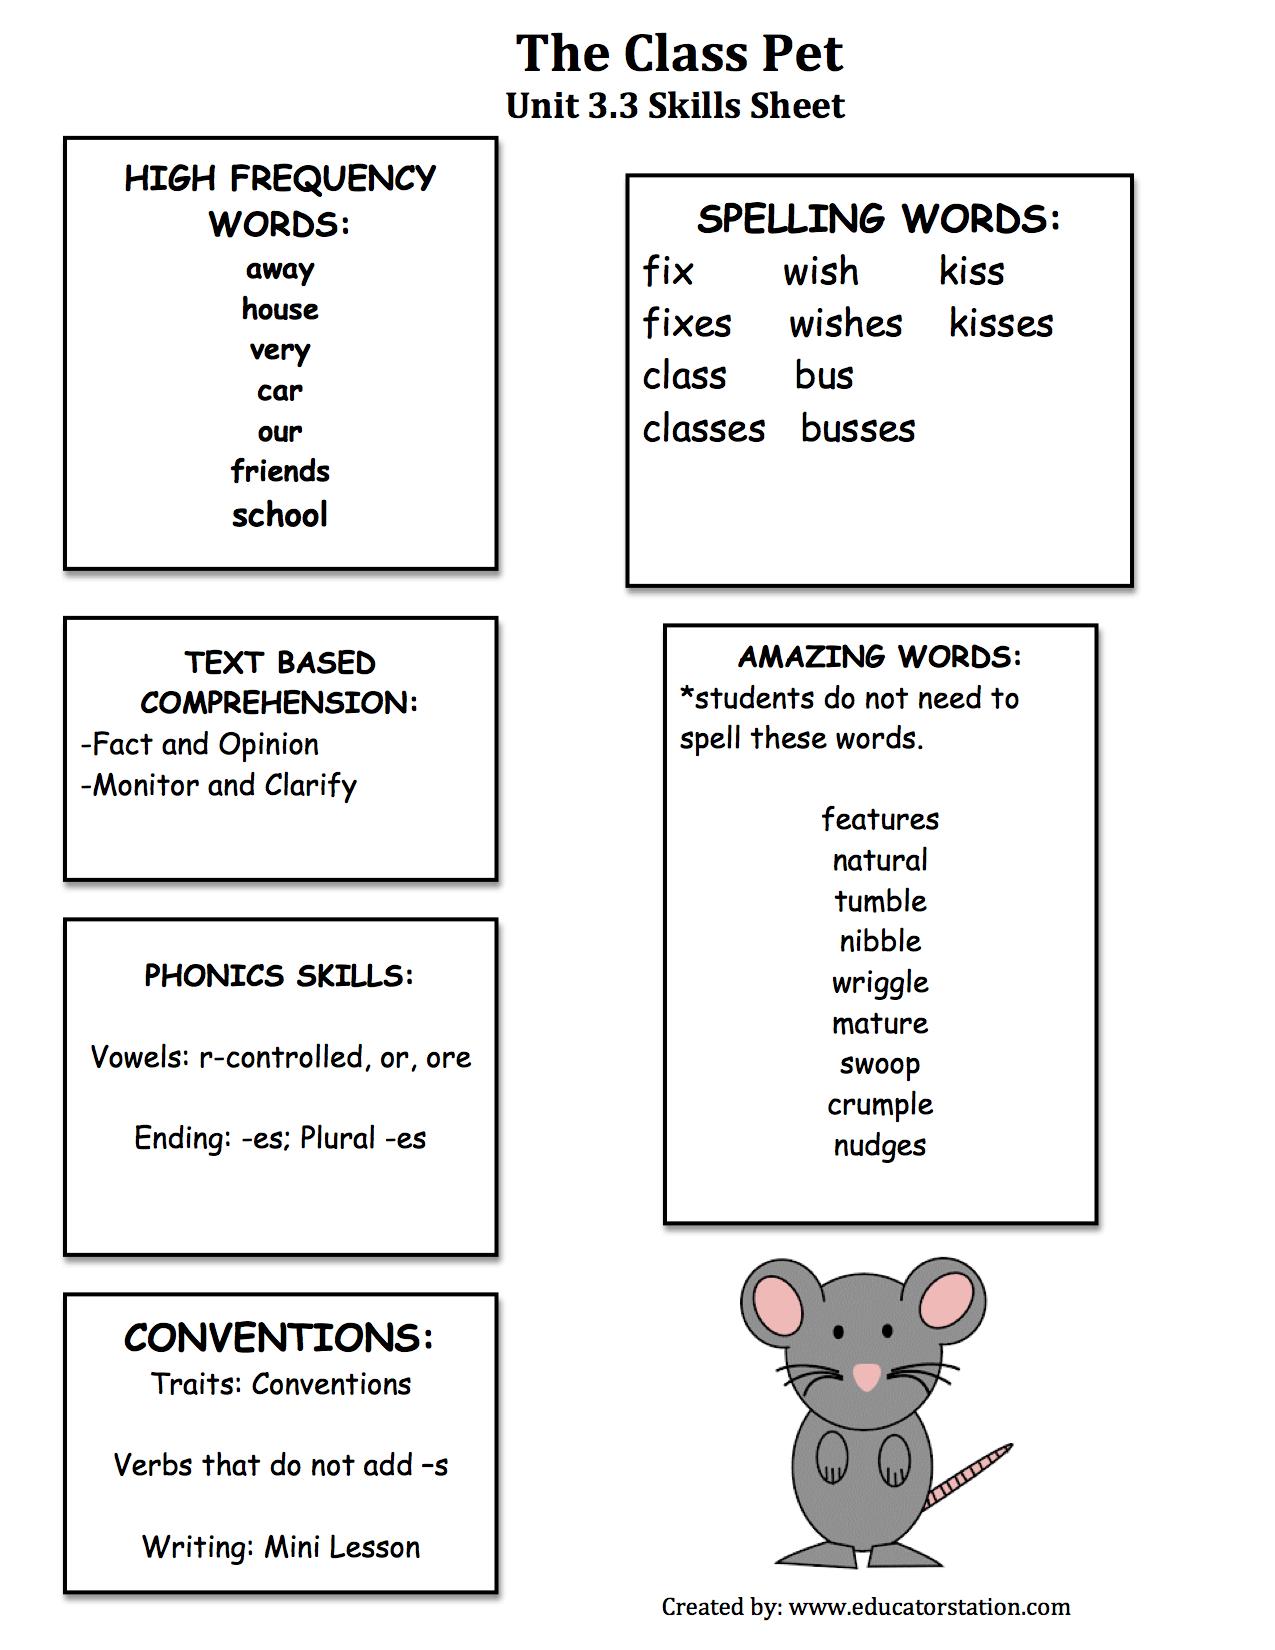 3 3 The Class Pet Skills Sheet